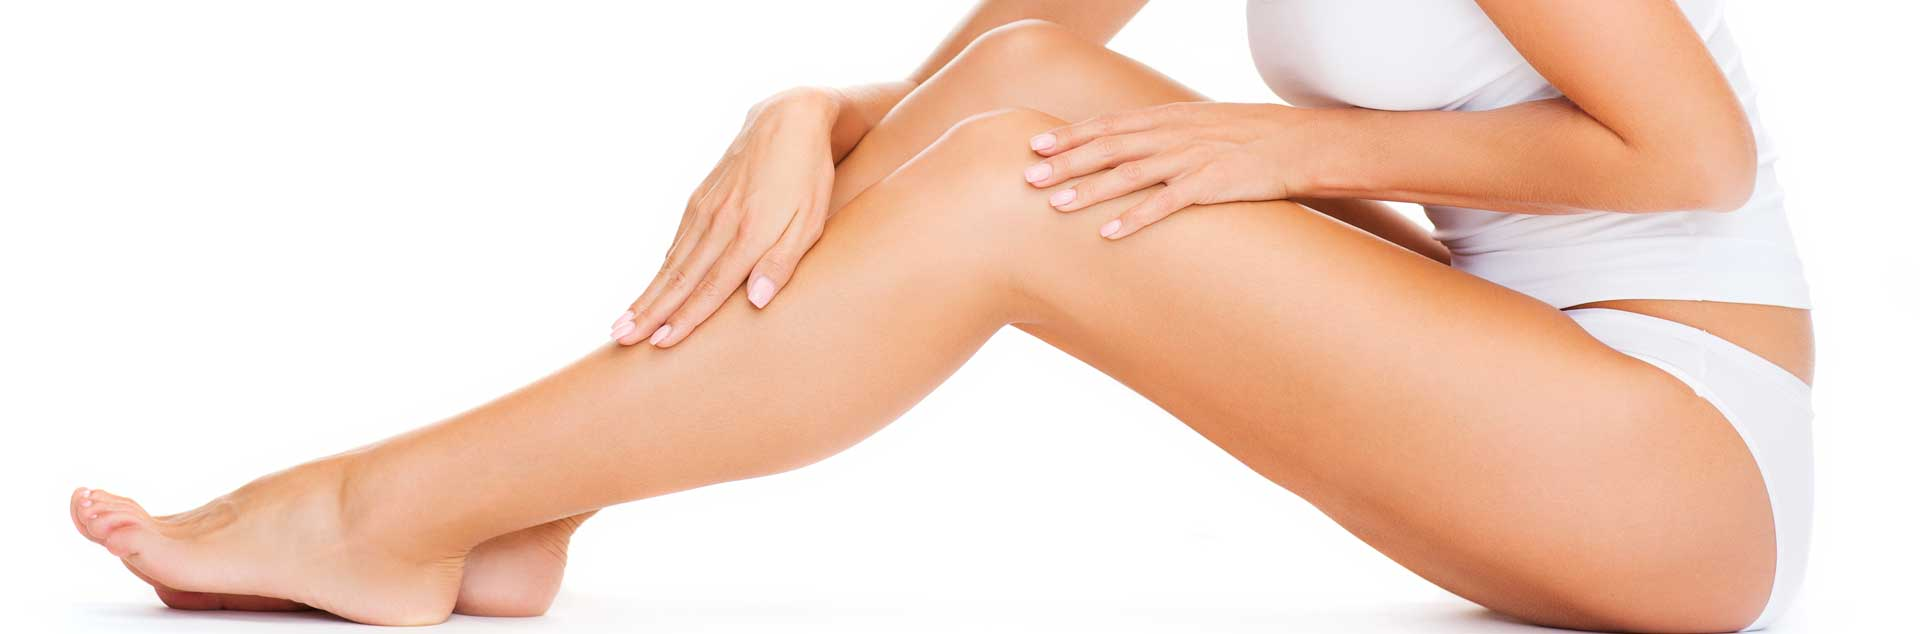 Cellulite Behandlung Dr. Arco